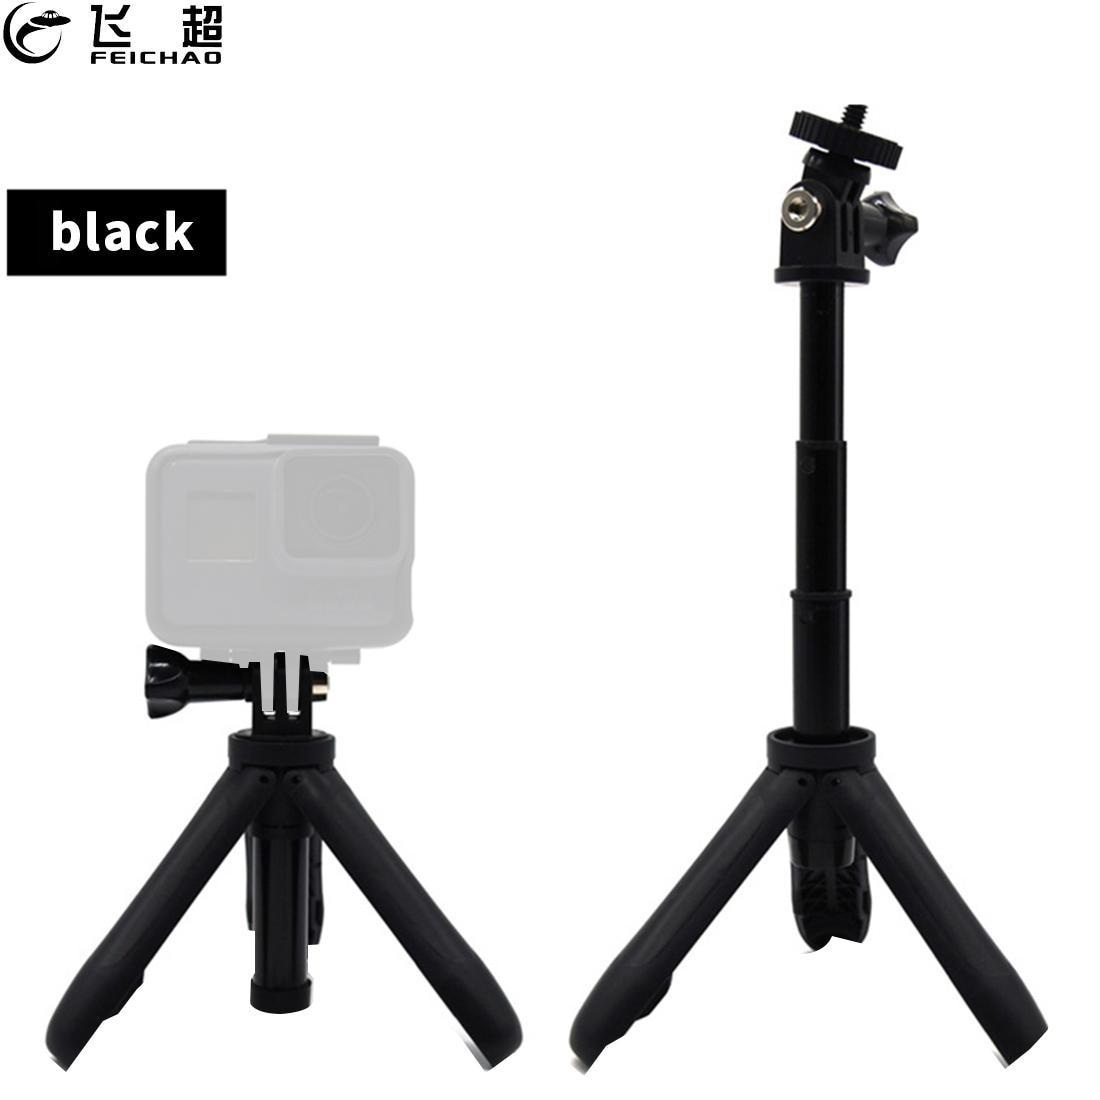 Mini Protable Tripod Extension Pole Handheld Monopod Pole Hand Grip Selfie Stick Mount for Gopro Hero 8 7 YI Osmo Action Camera-0